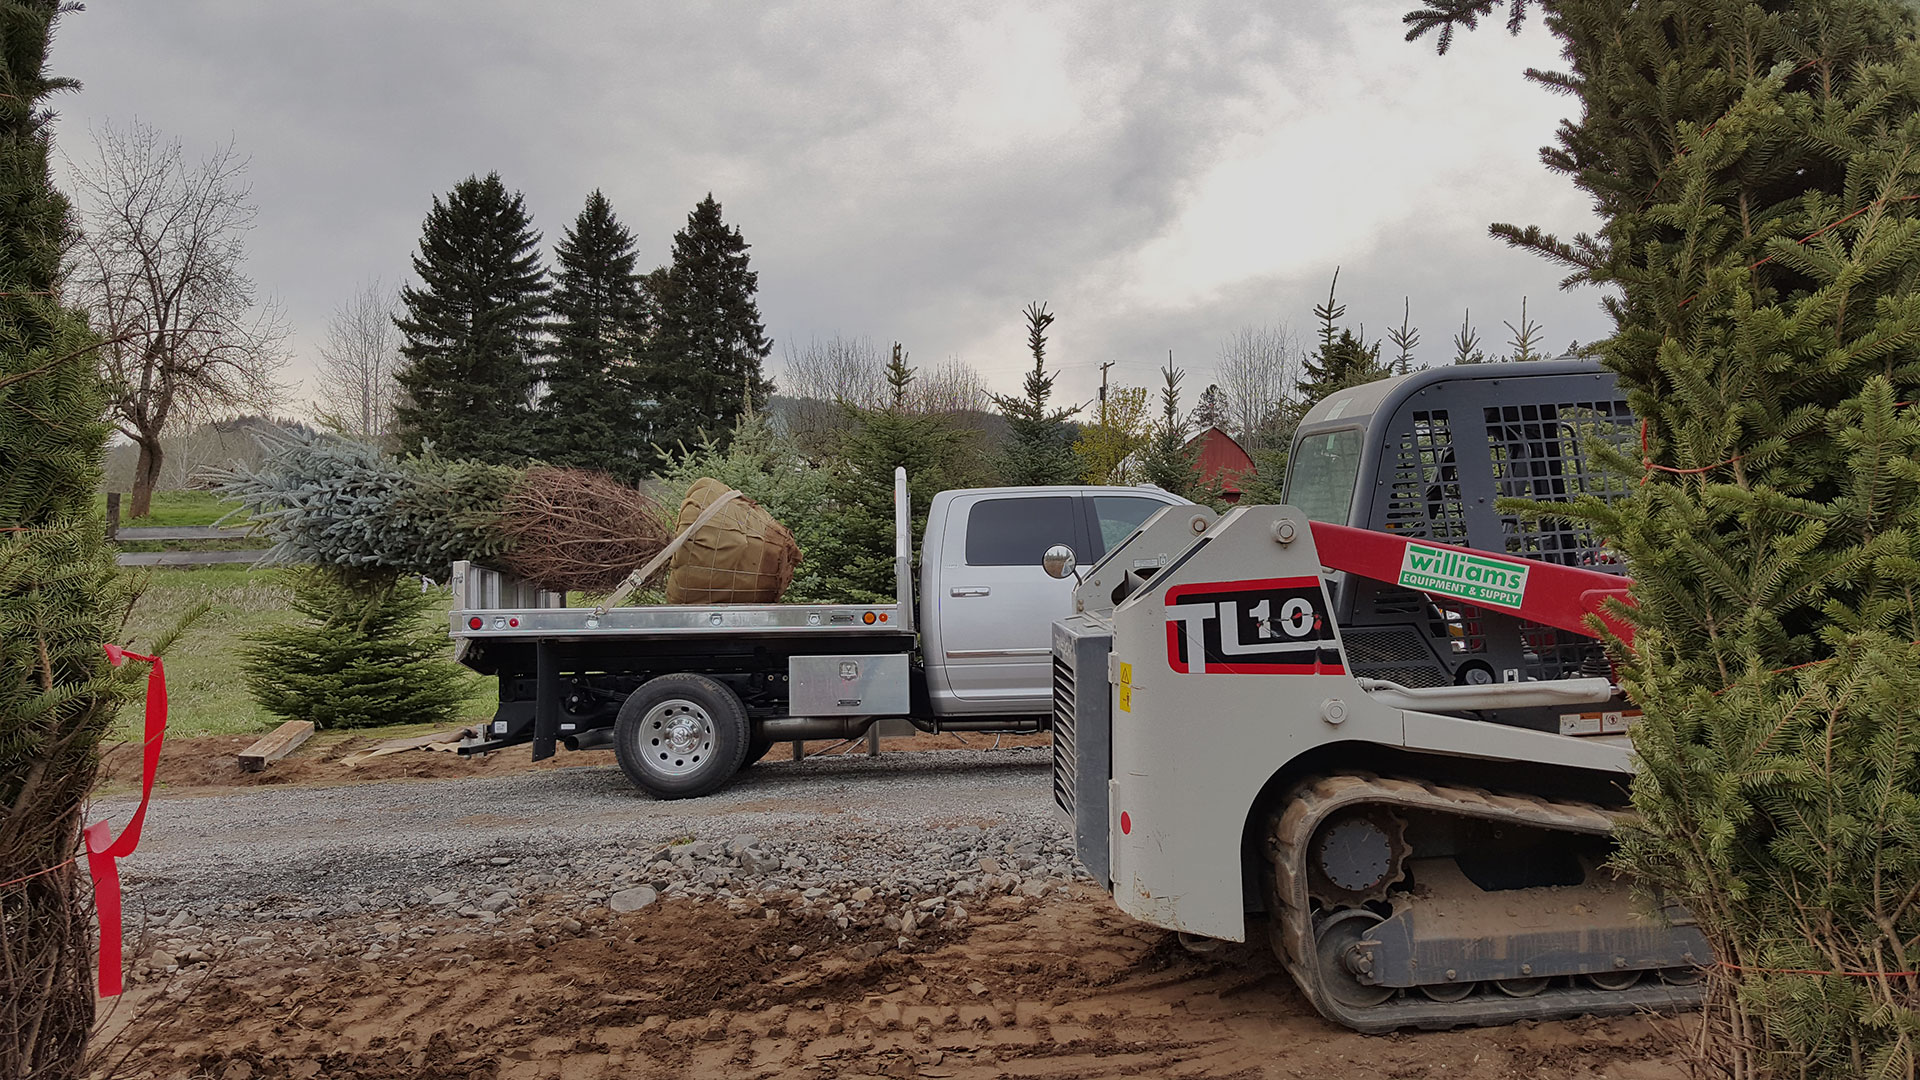 LakeView Lawncare & Landscape Co. Landscaping, Yard Maintenance and Sprinkler Repairs slide 4